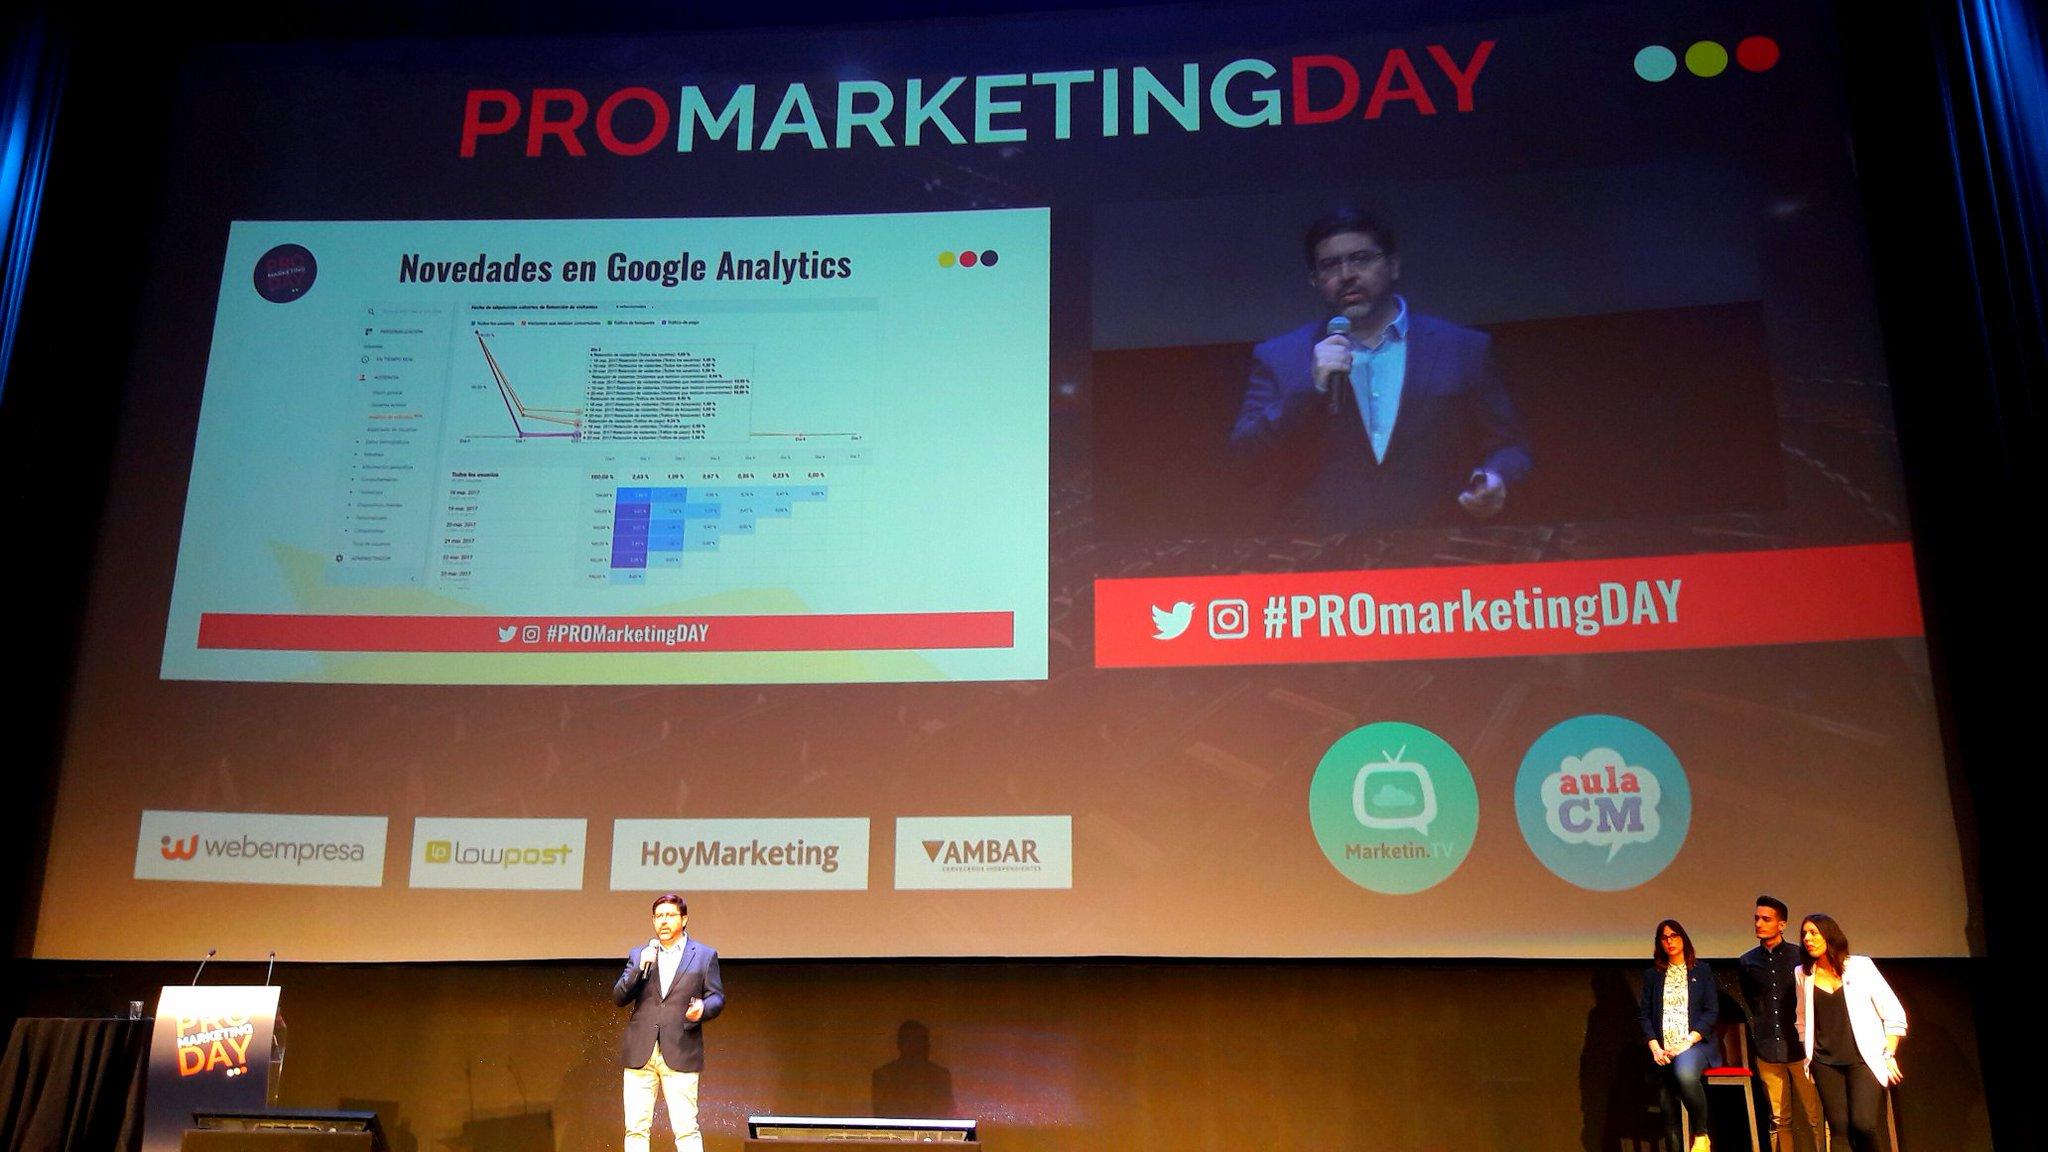 📊@FerRubioA, con las novedades de #googleAnalytics. Interesante la funcionalidad Page Analytics, q aporta mapa de clicks #ProMarketingDay https://t.co/lTeSA57AqJ